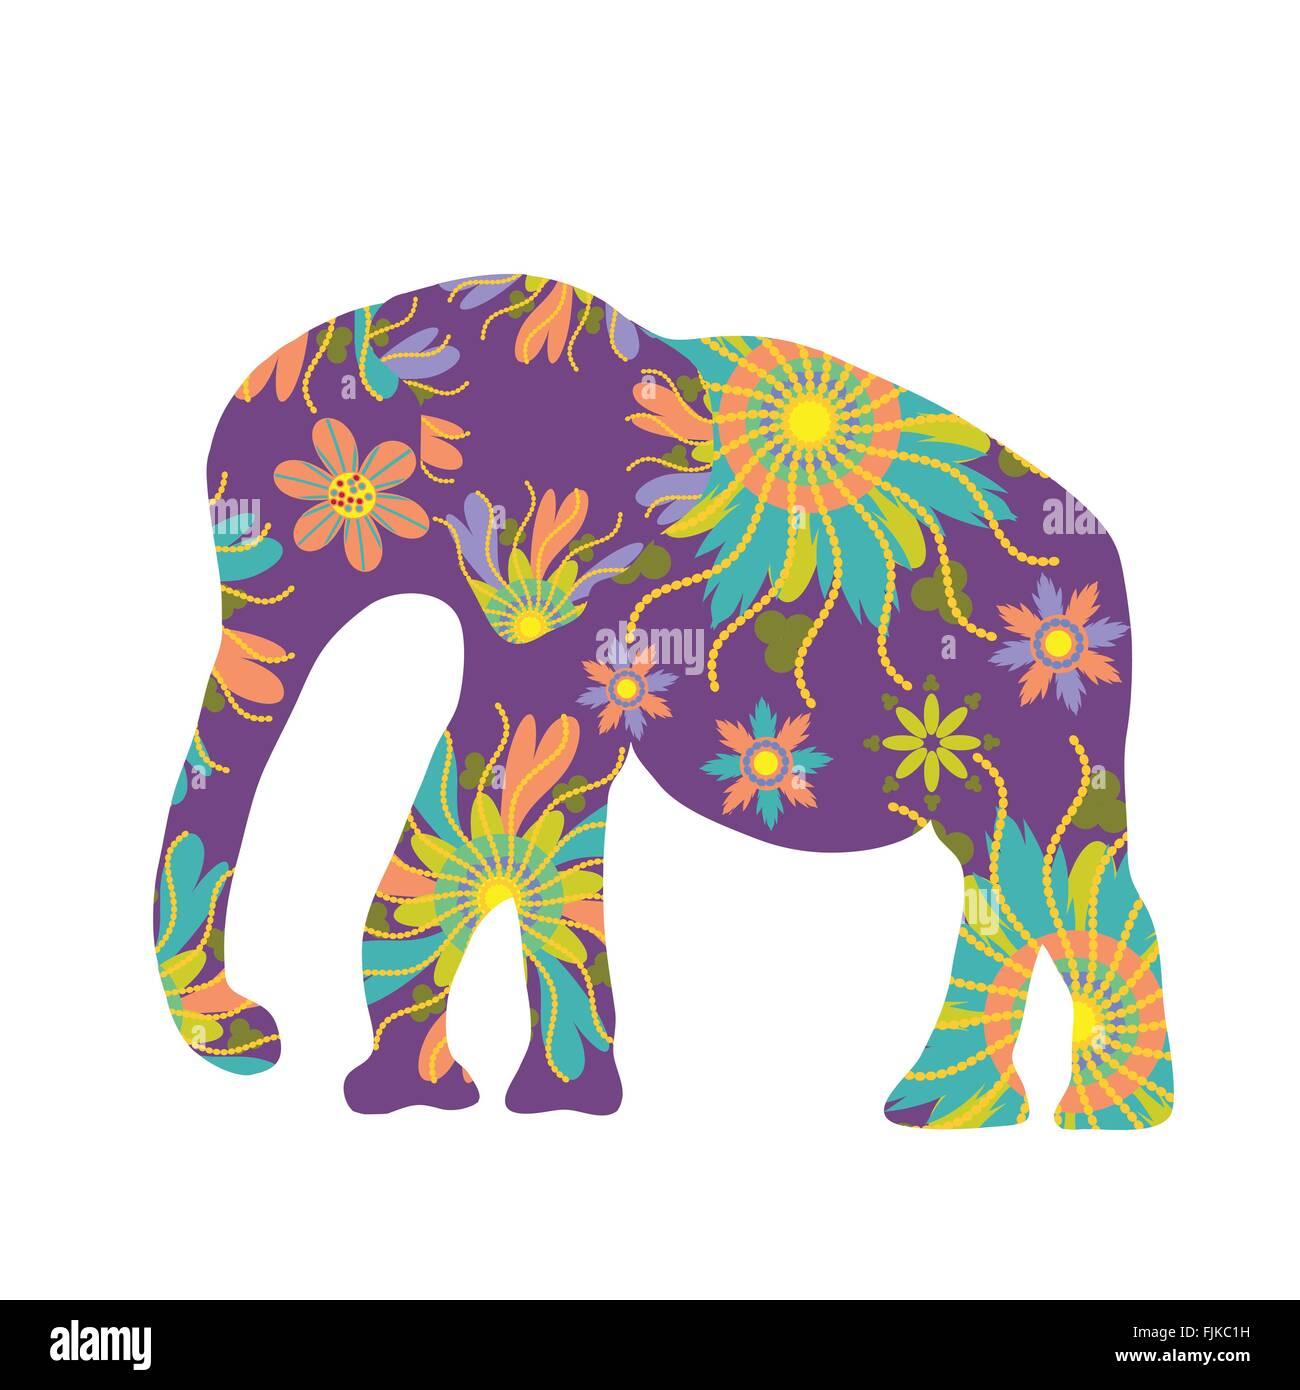 Elefant Vektor Silhouette Süße Vorlage Vektor Abbildung Bild